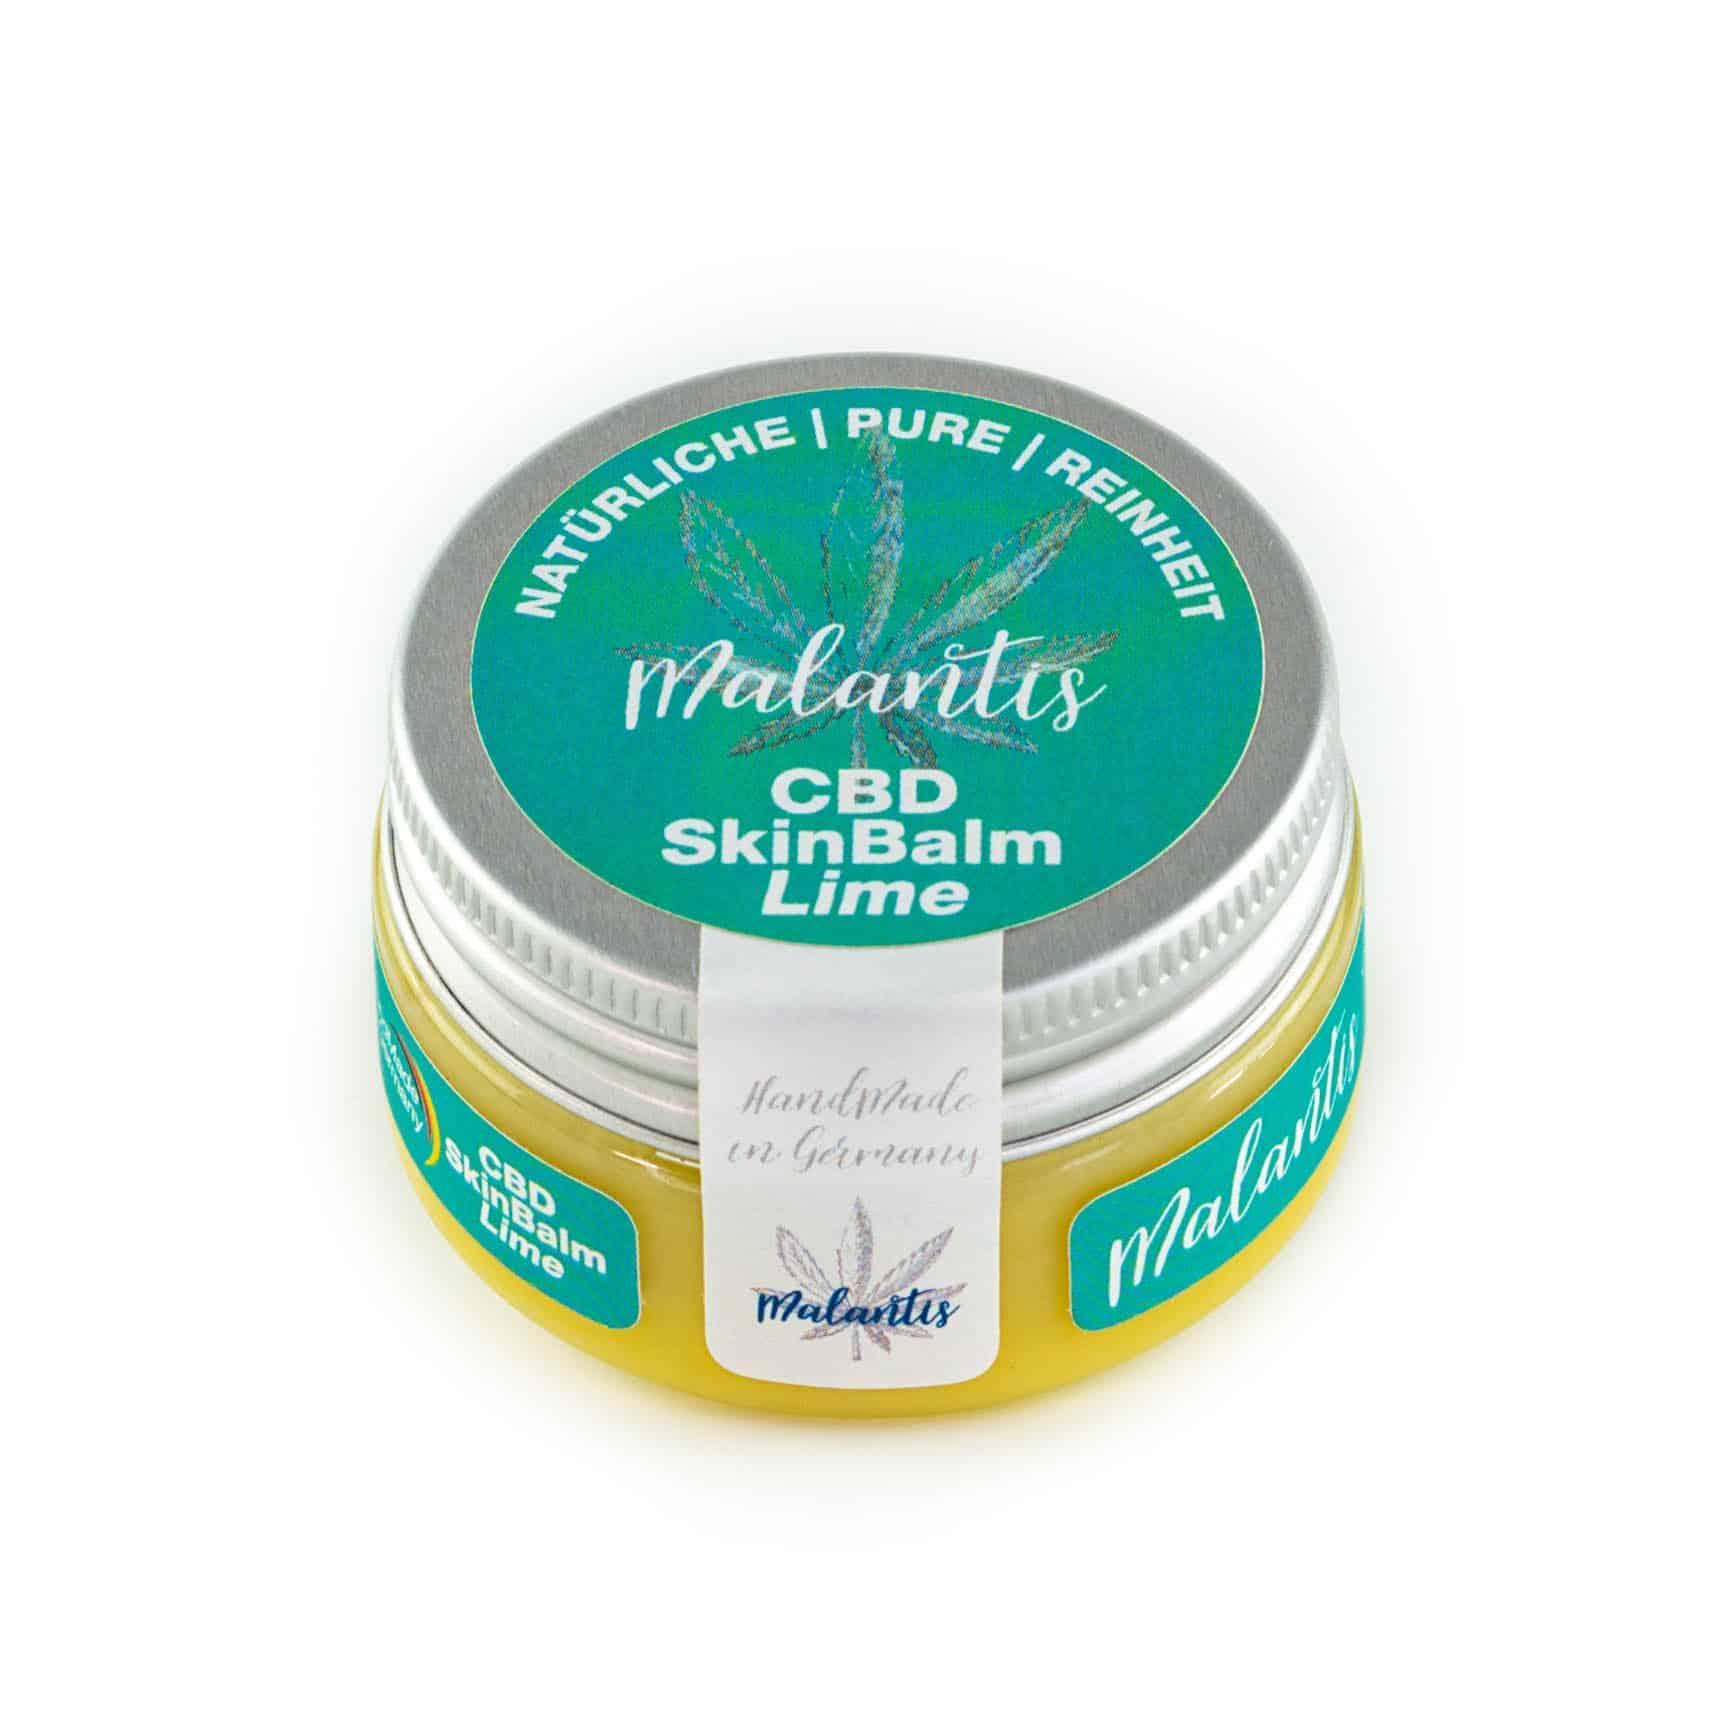 Malantis CBD SkinBalm Lime